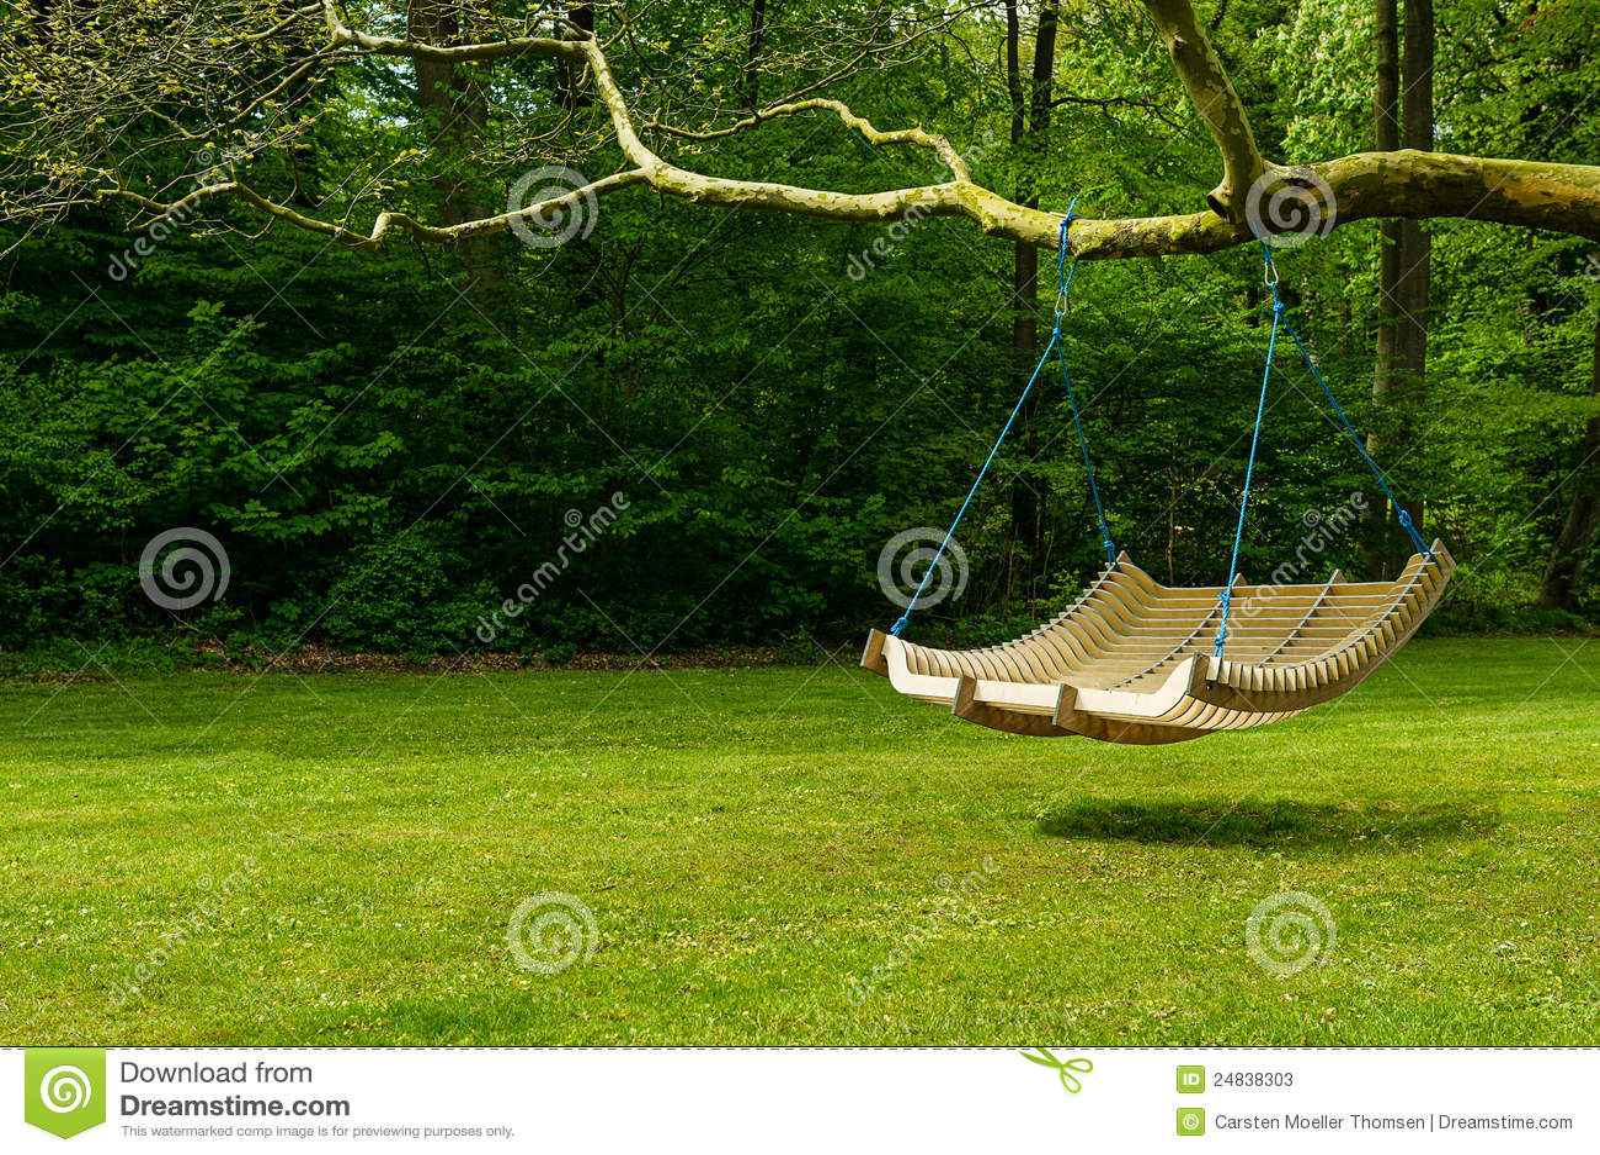 Swing Bench In Lush Garden Stock Photos Image 24838303